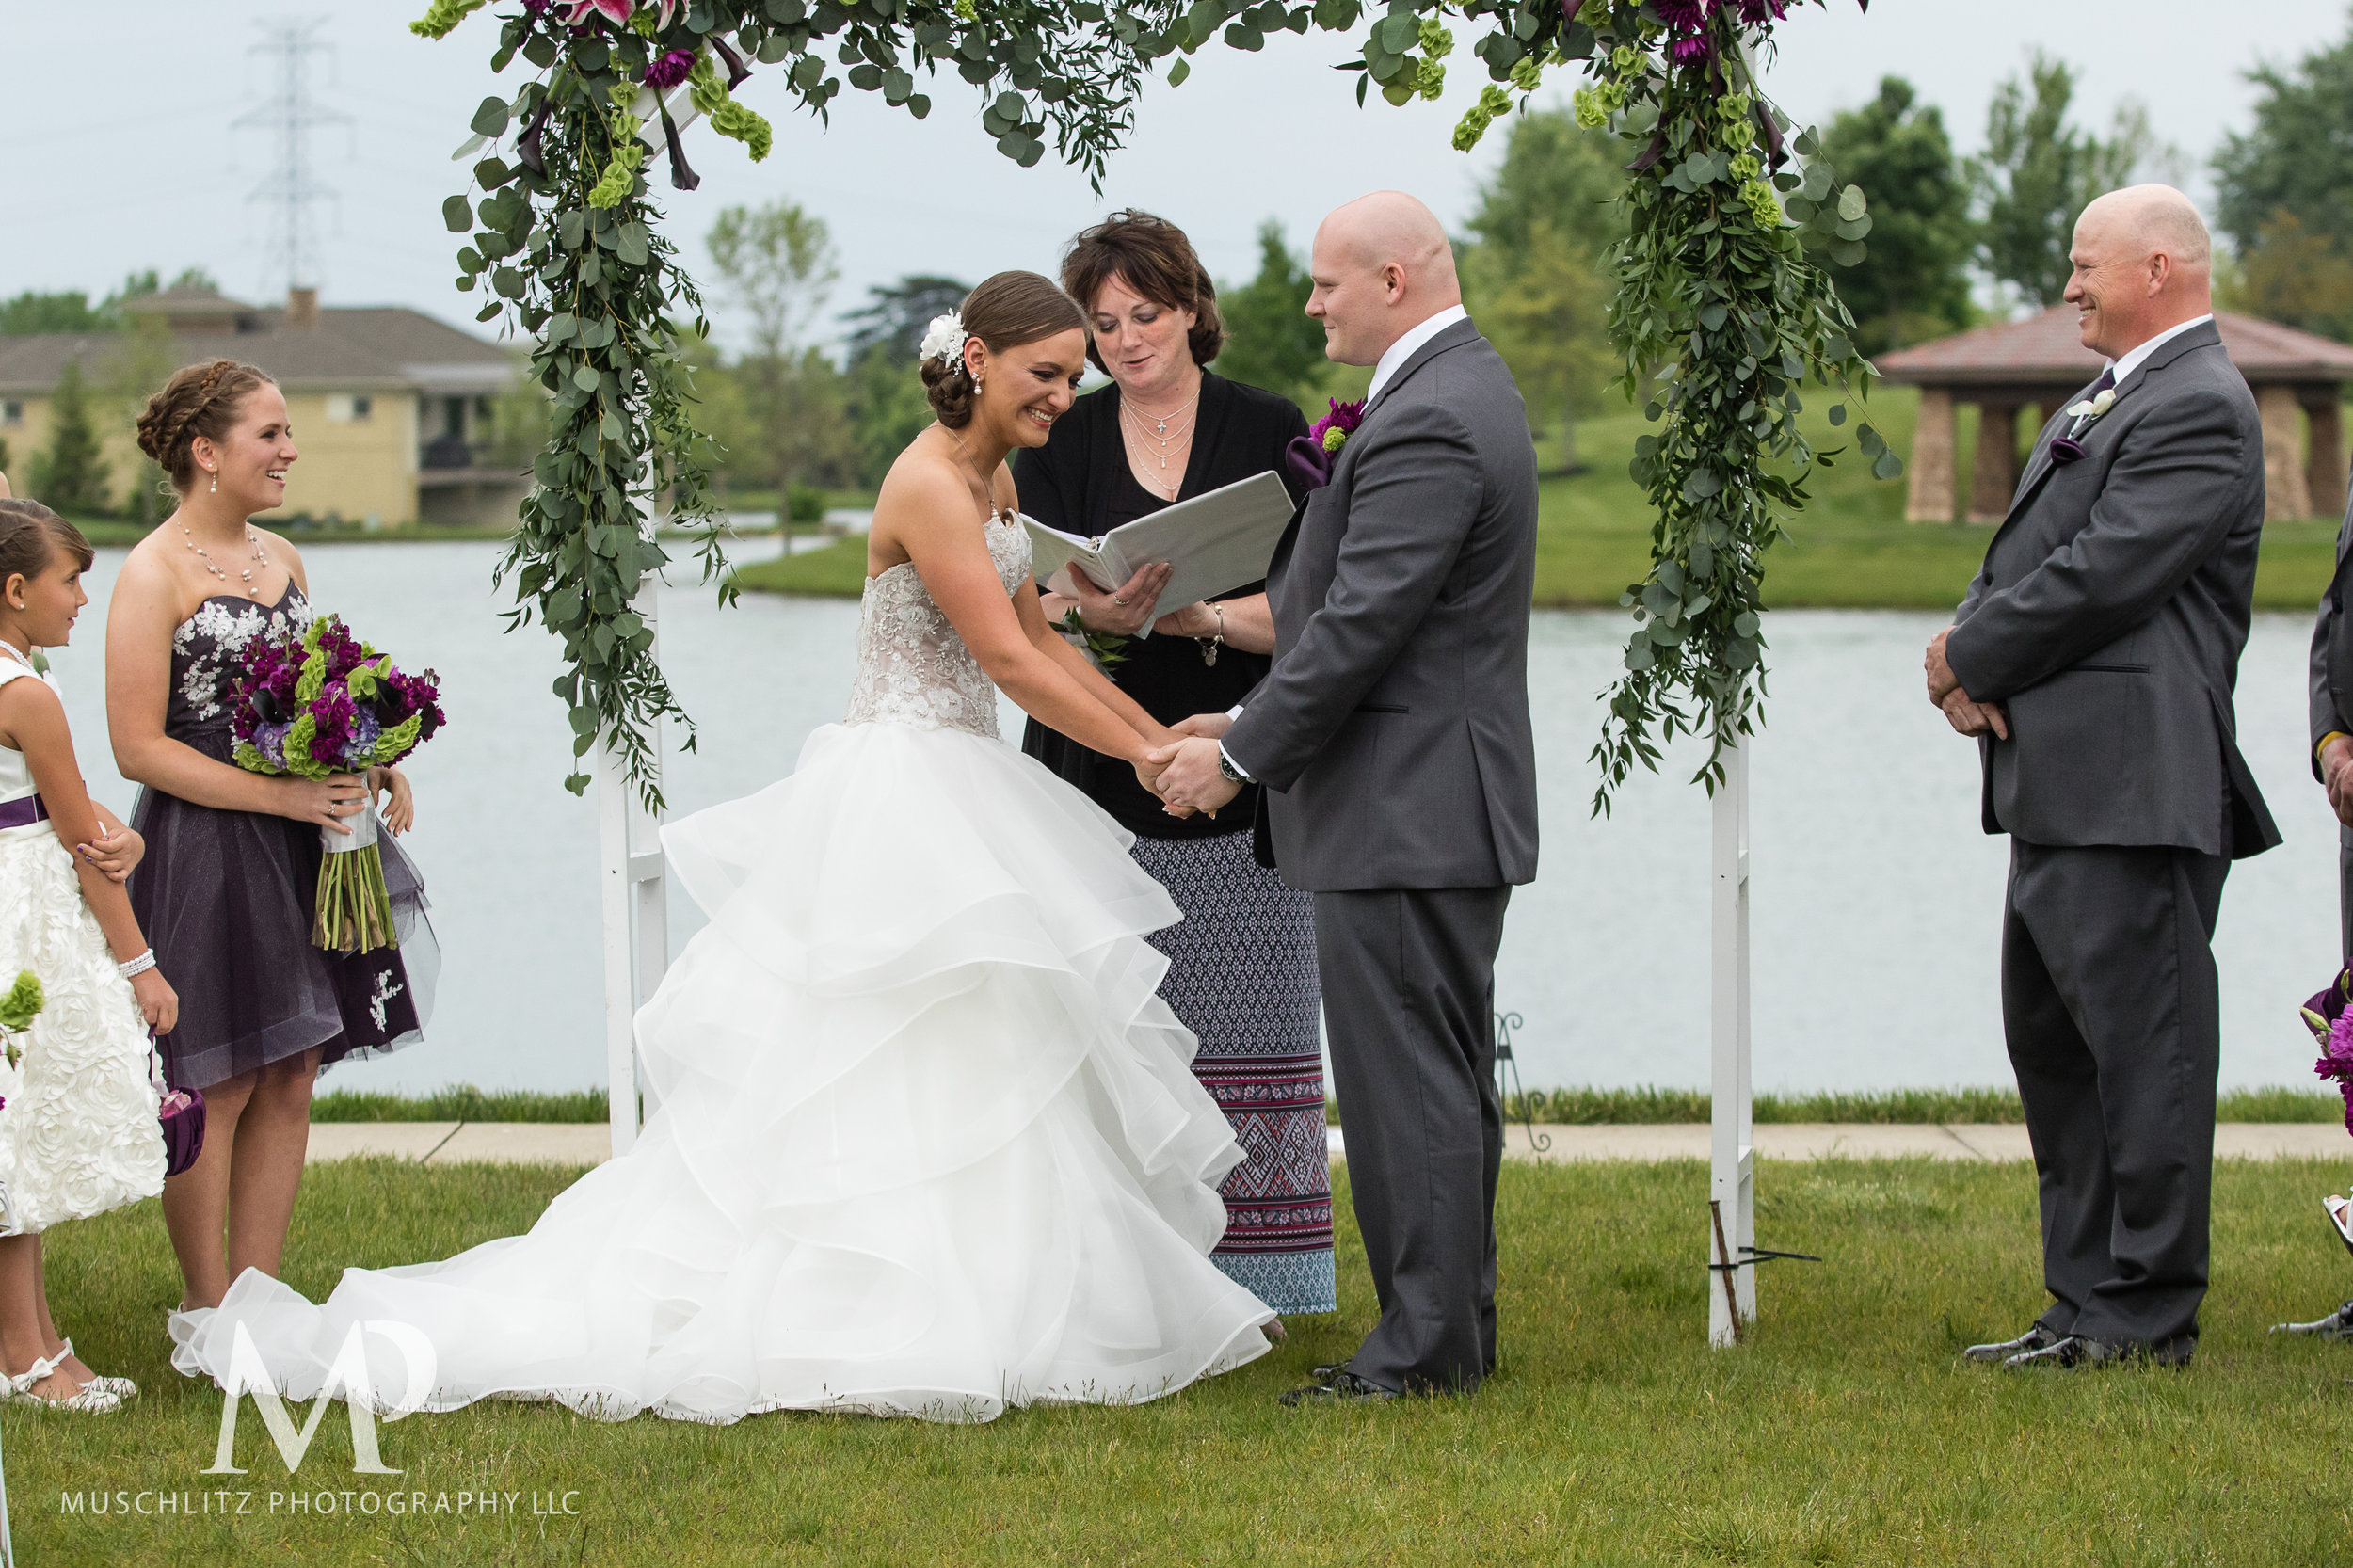 club-at-corazon-wedding-ceremony-reception-columbus-dublin-ohio-ohio-university-theme-038.JPG